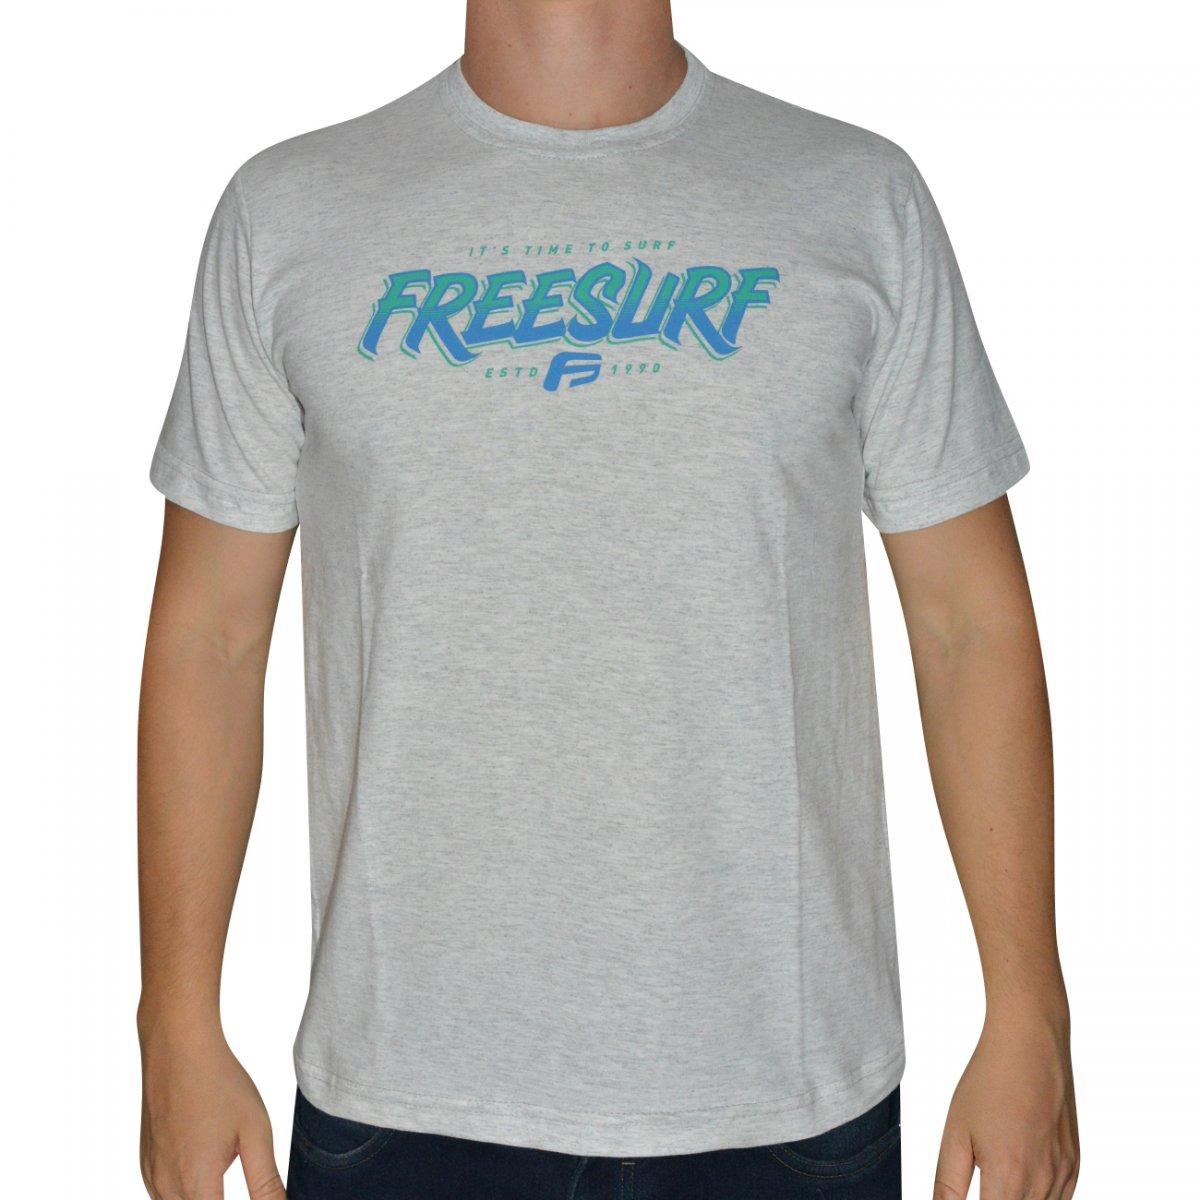 comprar camisetas da free surf 0befafebd8a